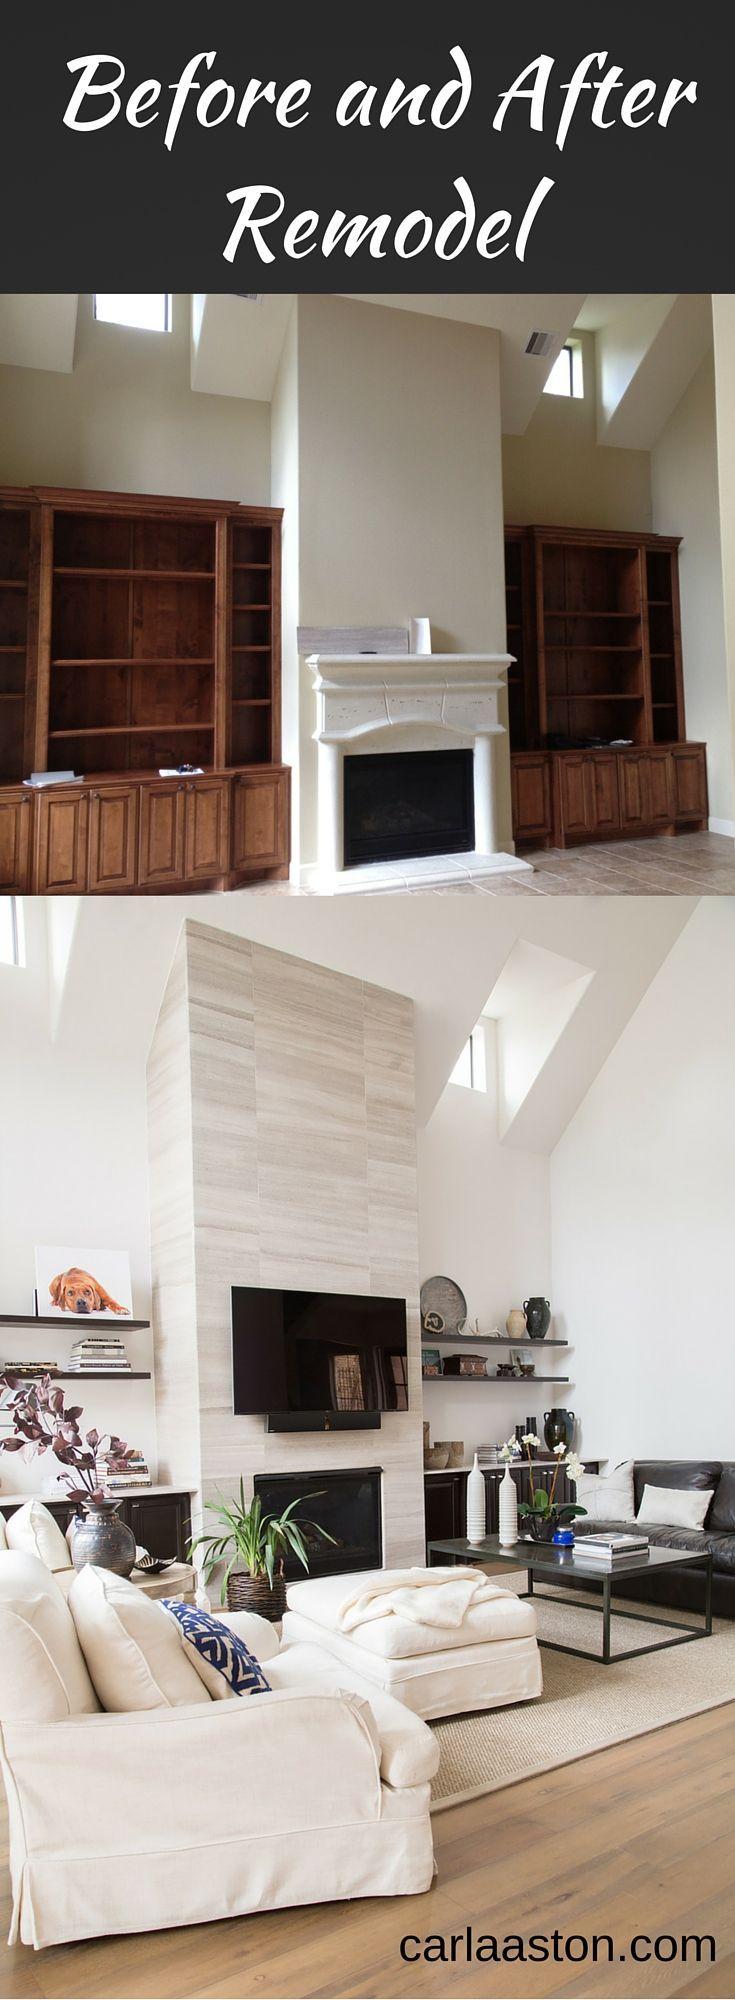 25 Best Ideas About Tile Around Fireplace On Pinterest Mantel Clock Design Tiled Fireplace